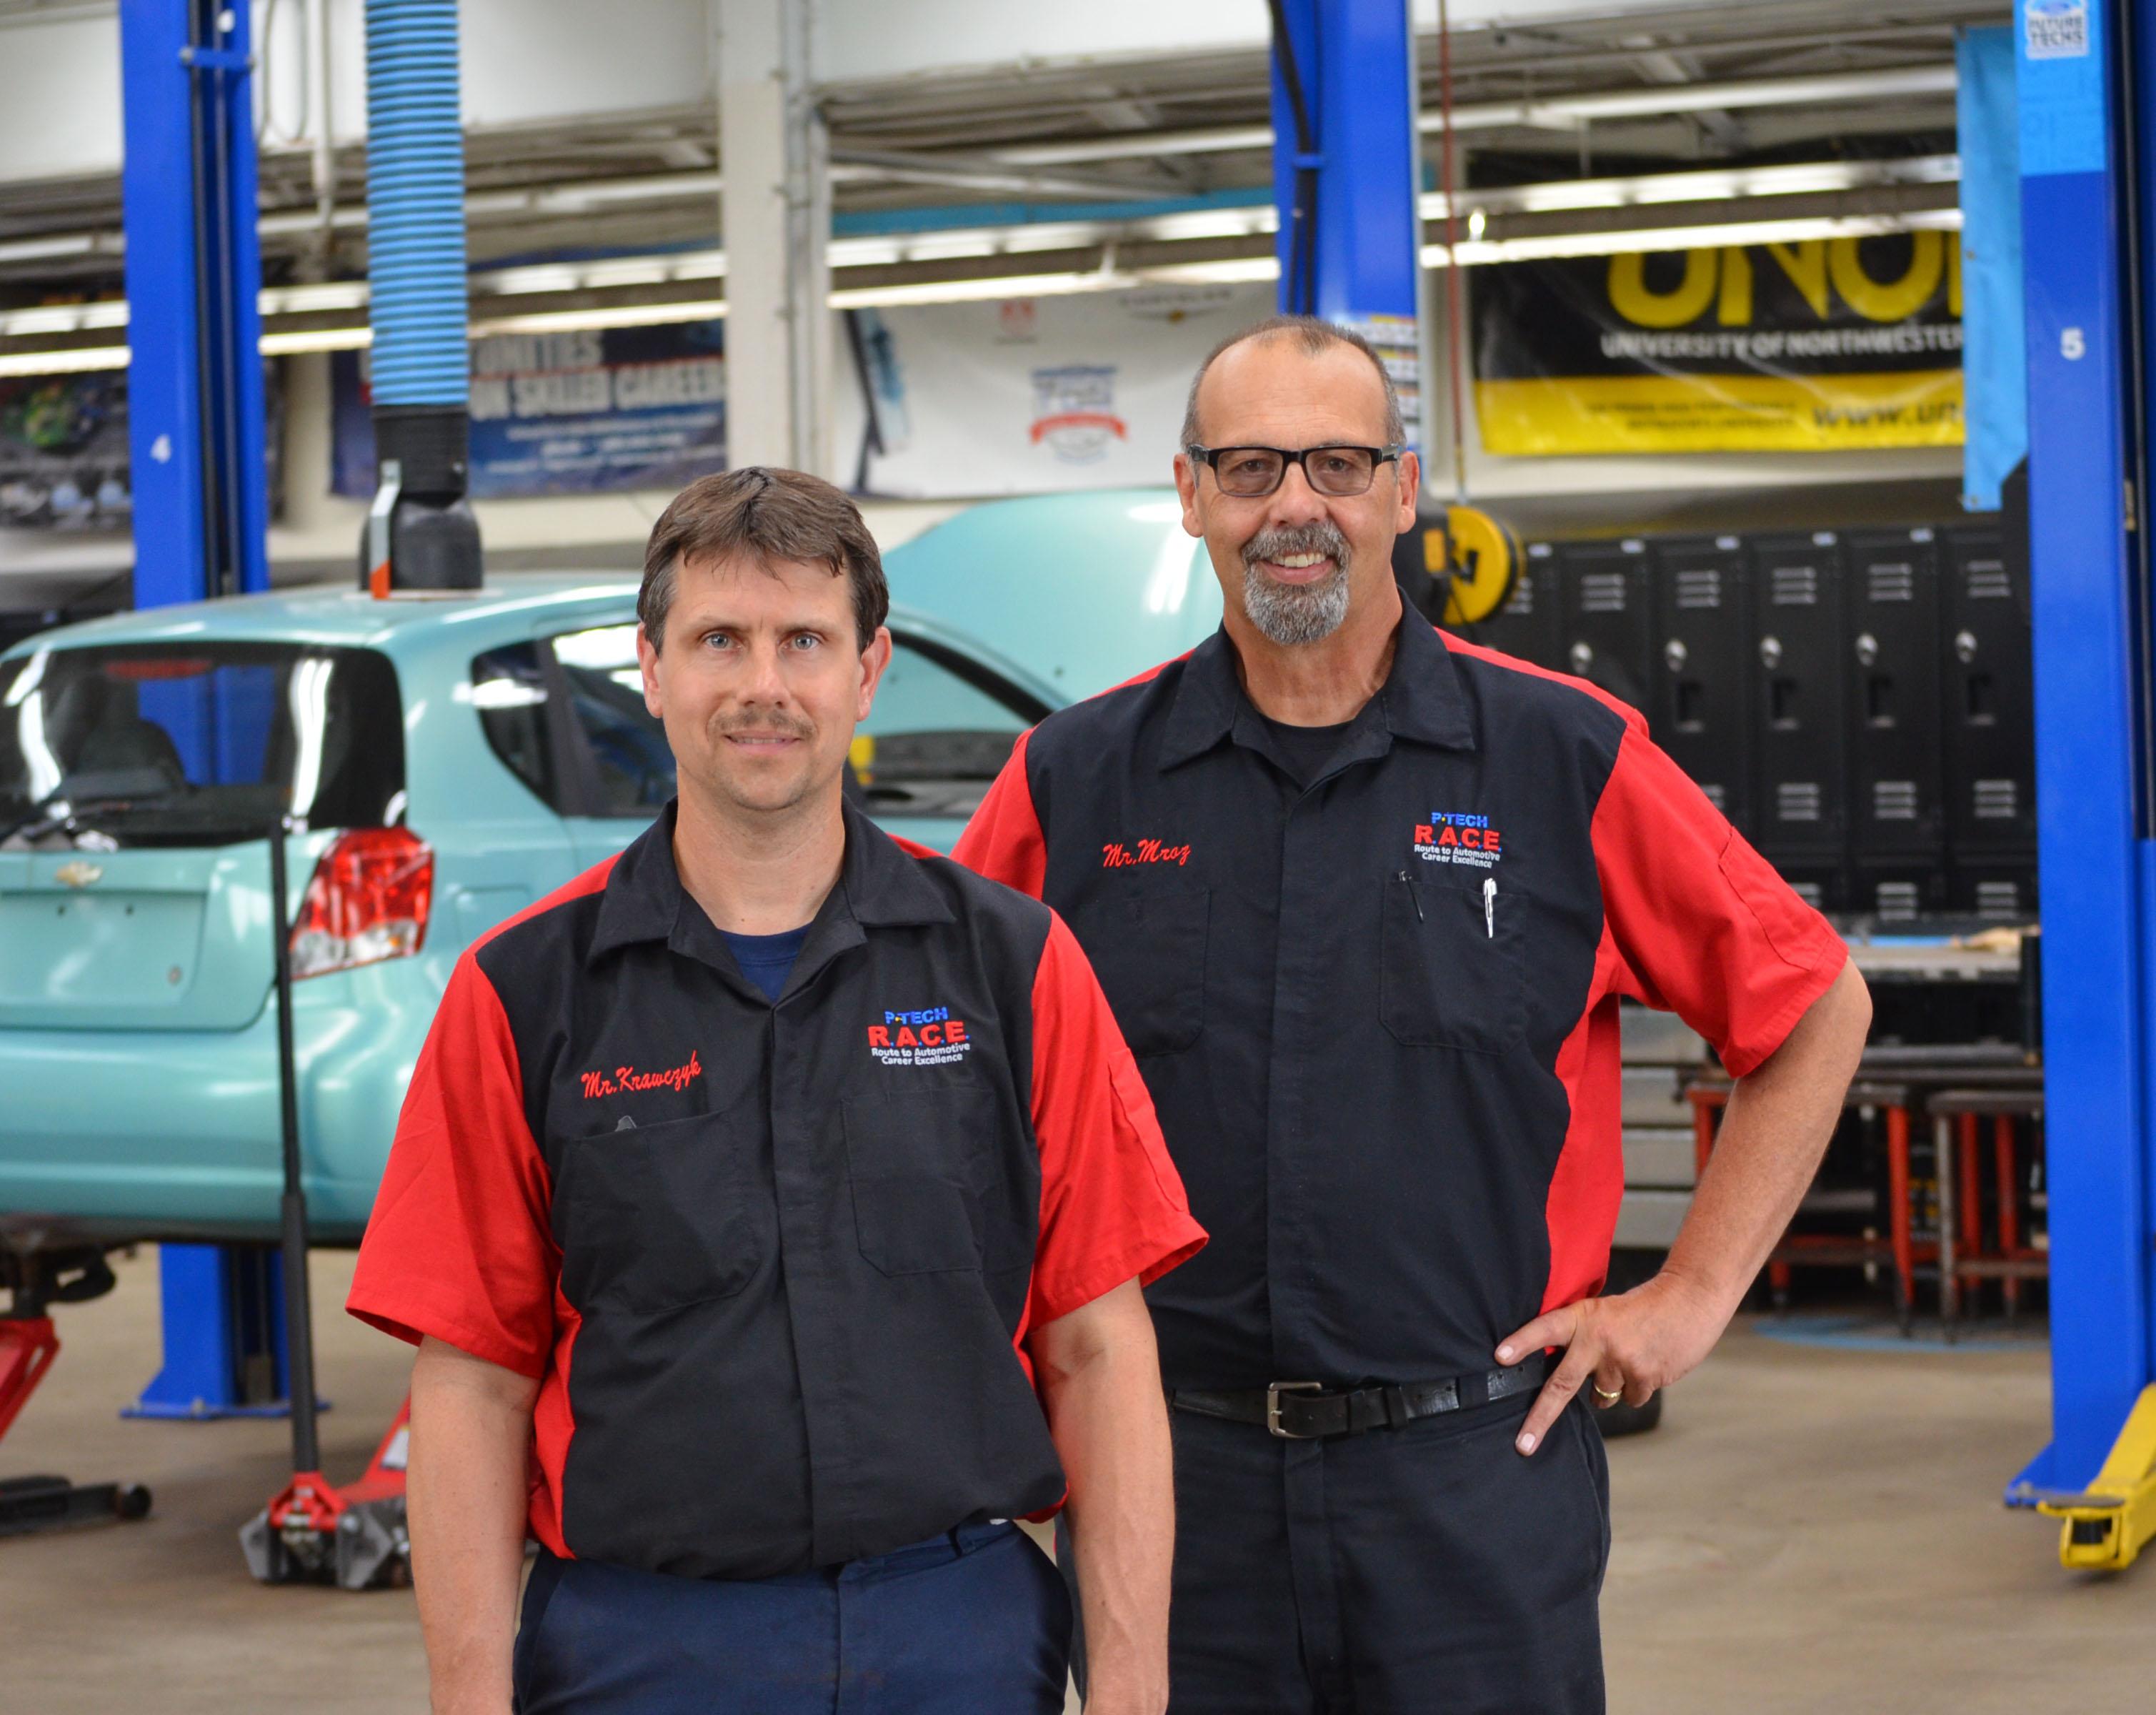 David Krawczyk and Robert Mroz